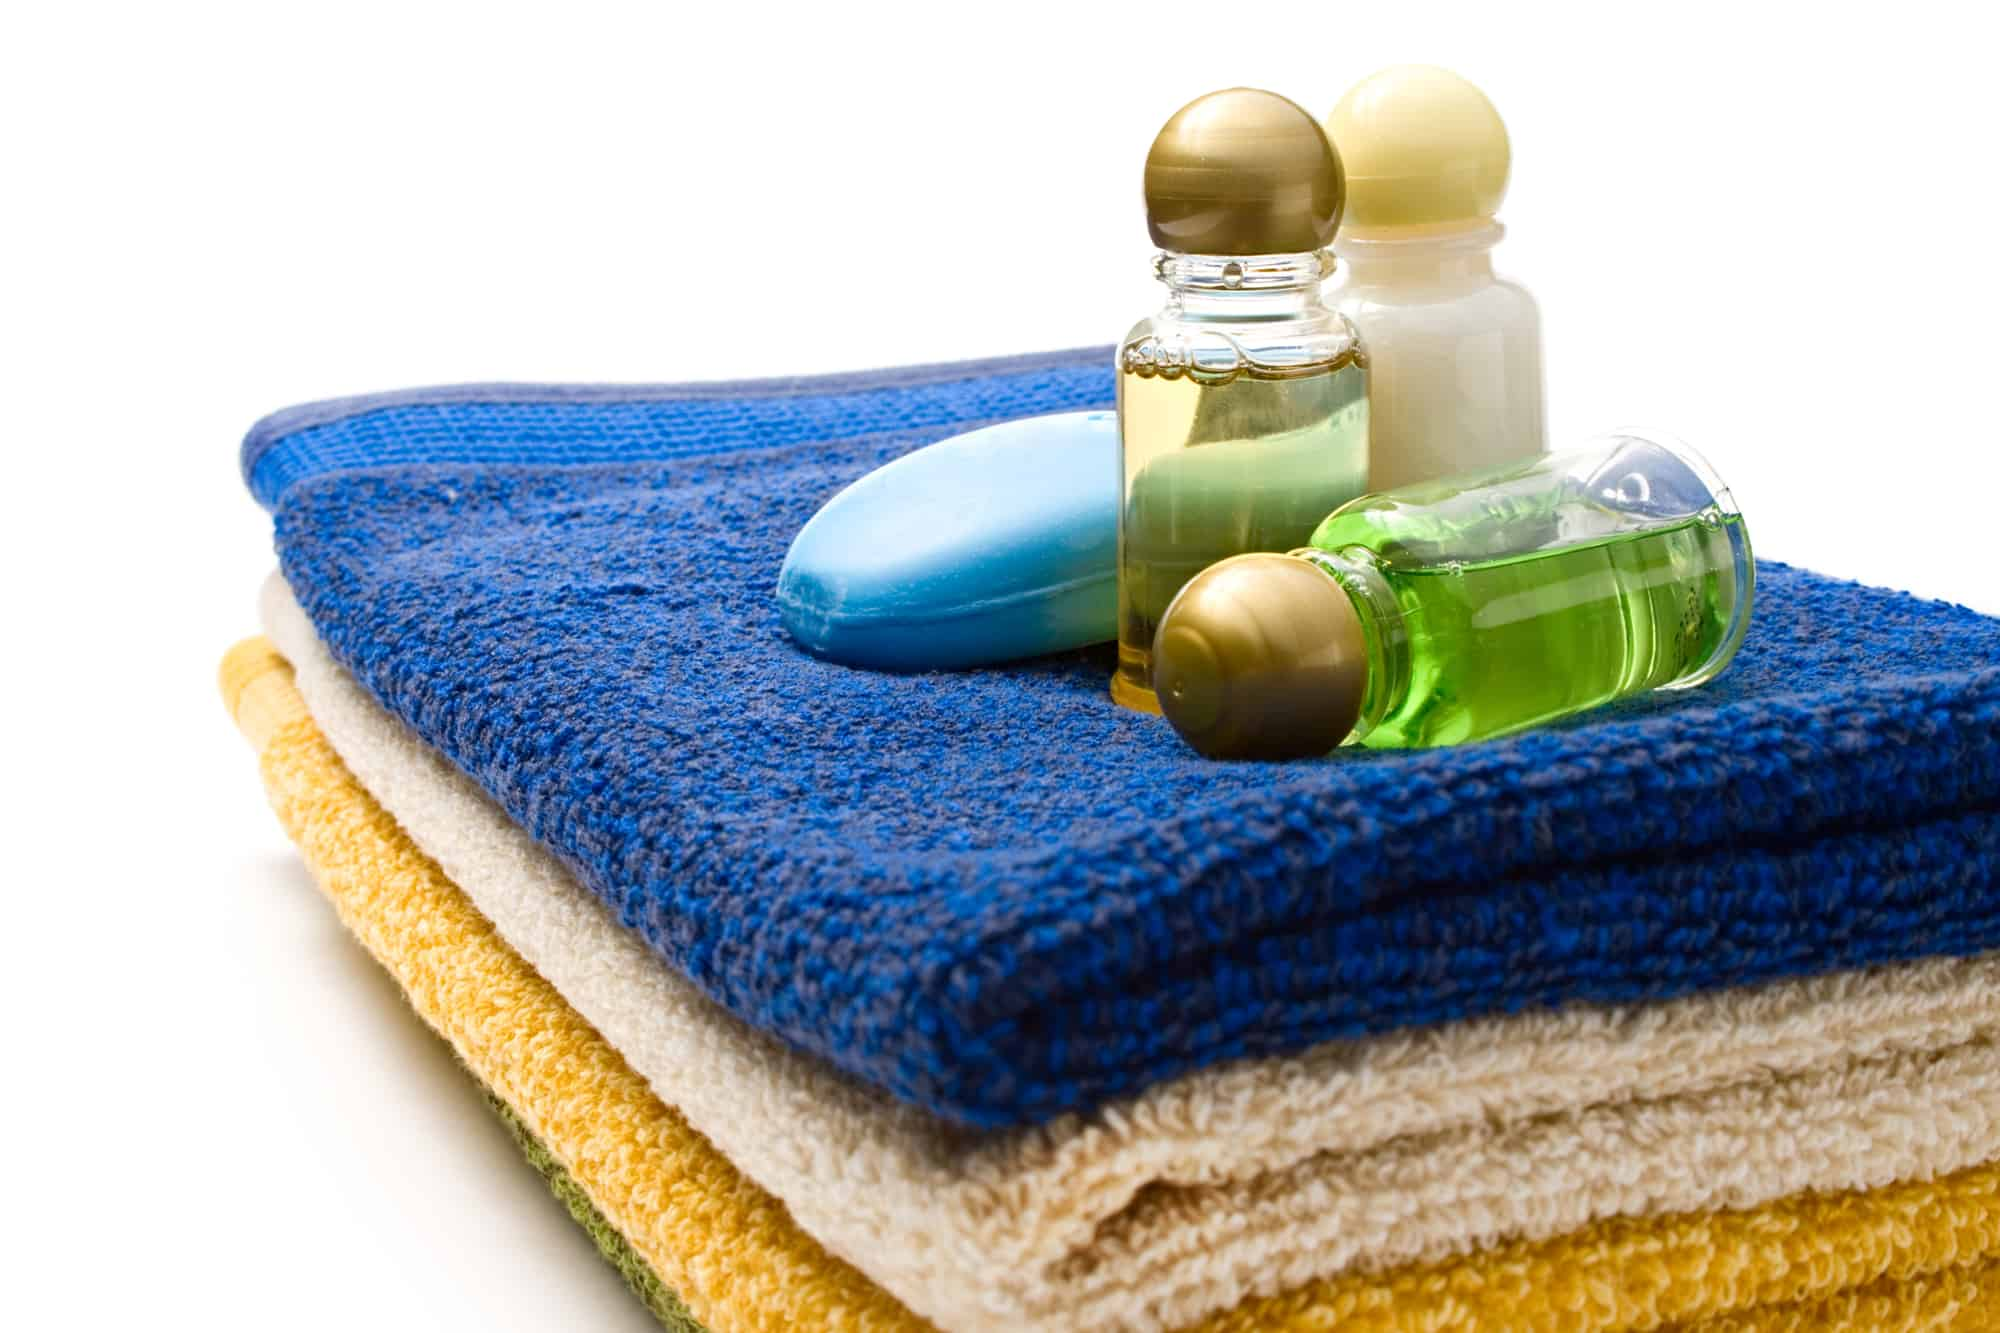 Towels and single-use plastic shampoo bottles